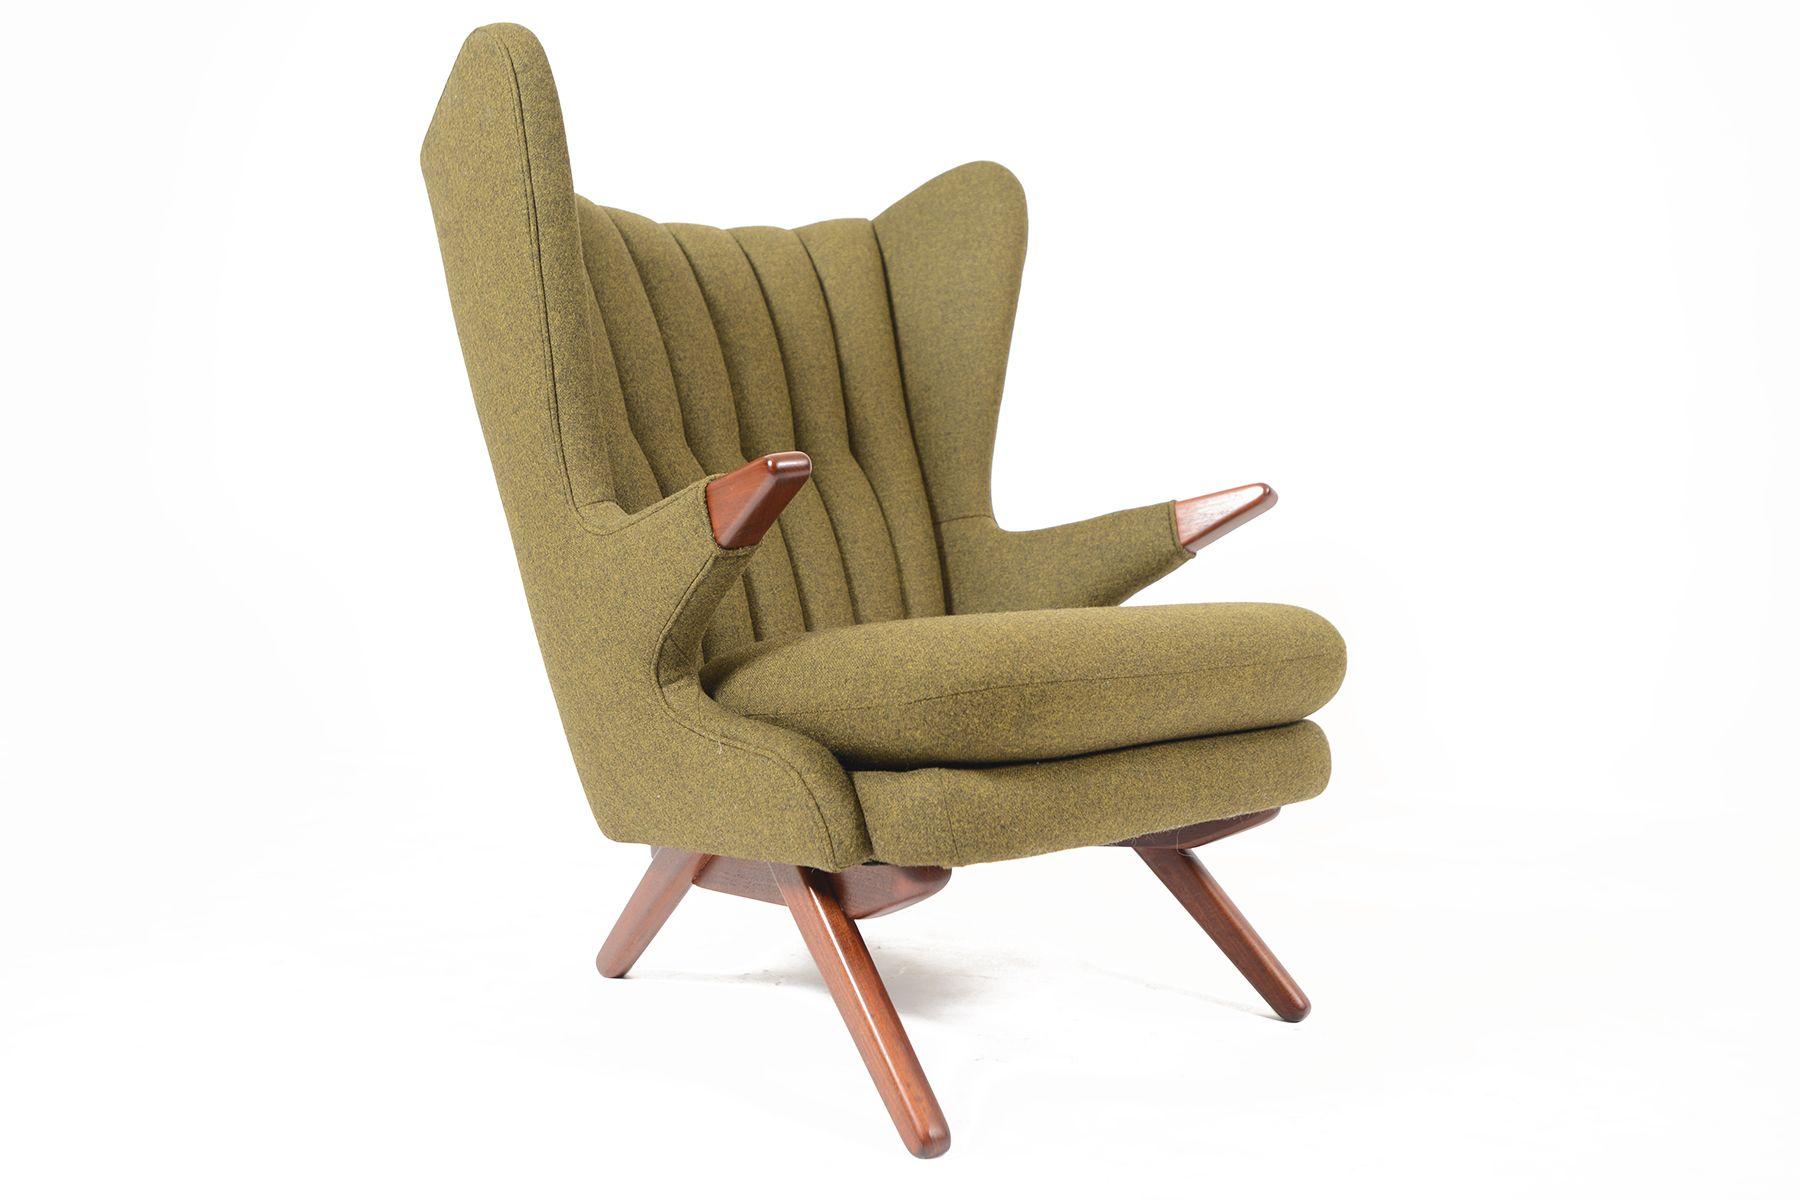 Svend Skipper Model 91 Papa Bear Chair in Olive Wool